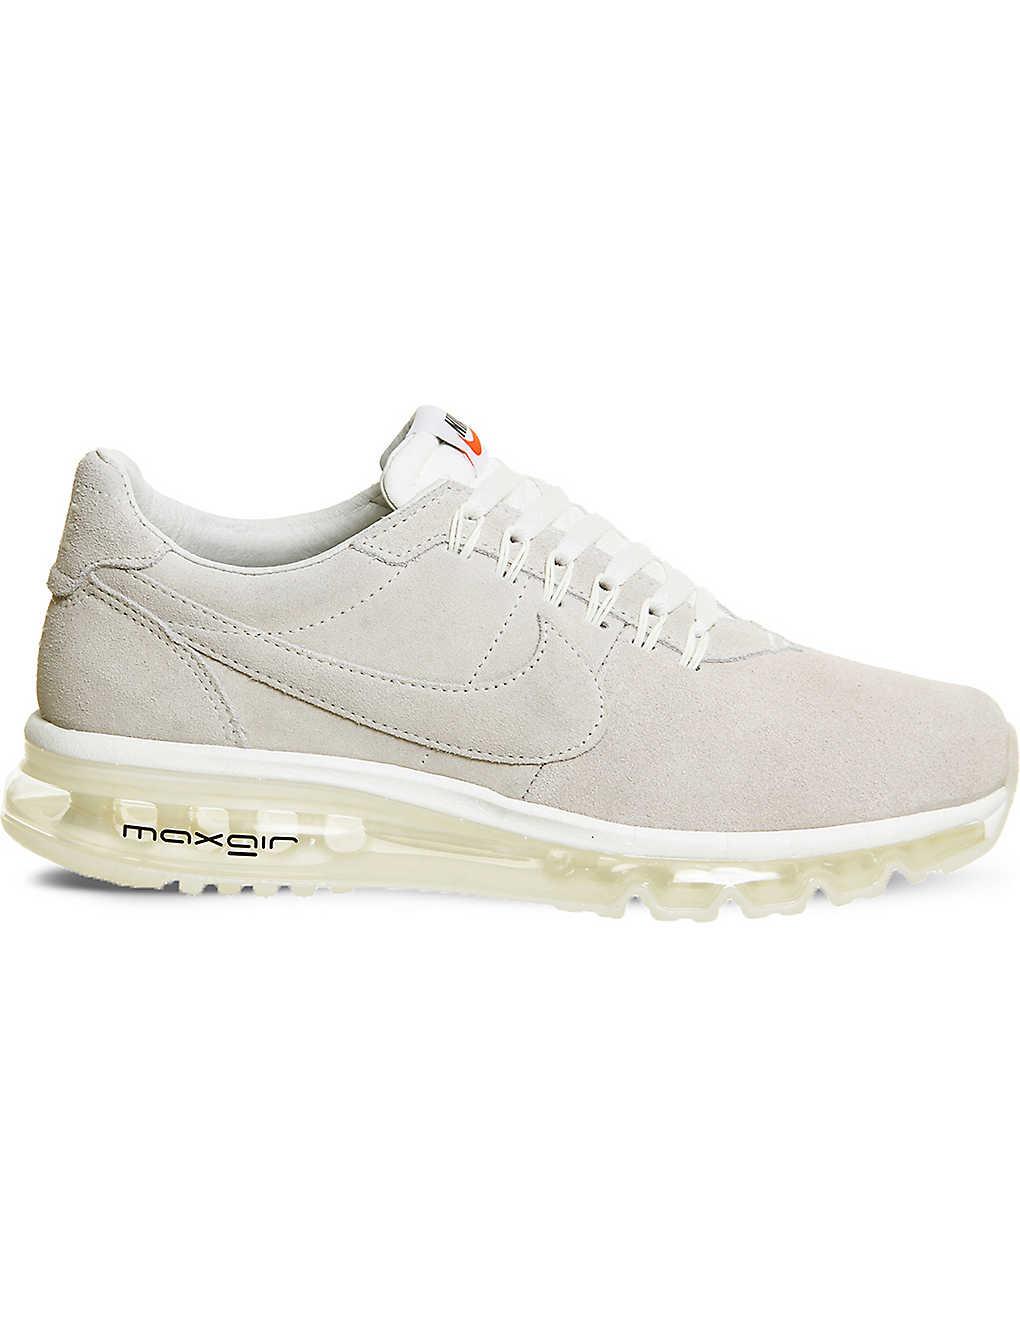 nike Air Max 87 Zero QS Synthetic men running shoes